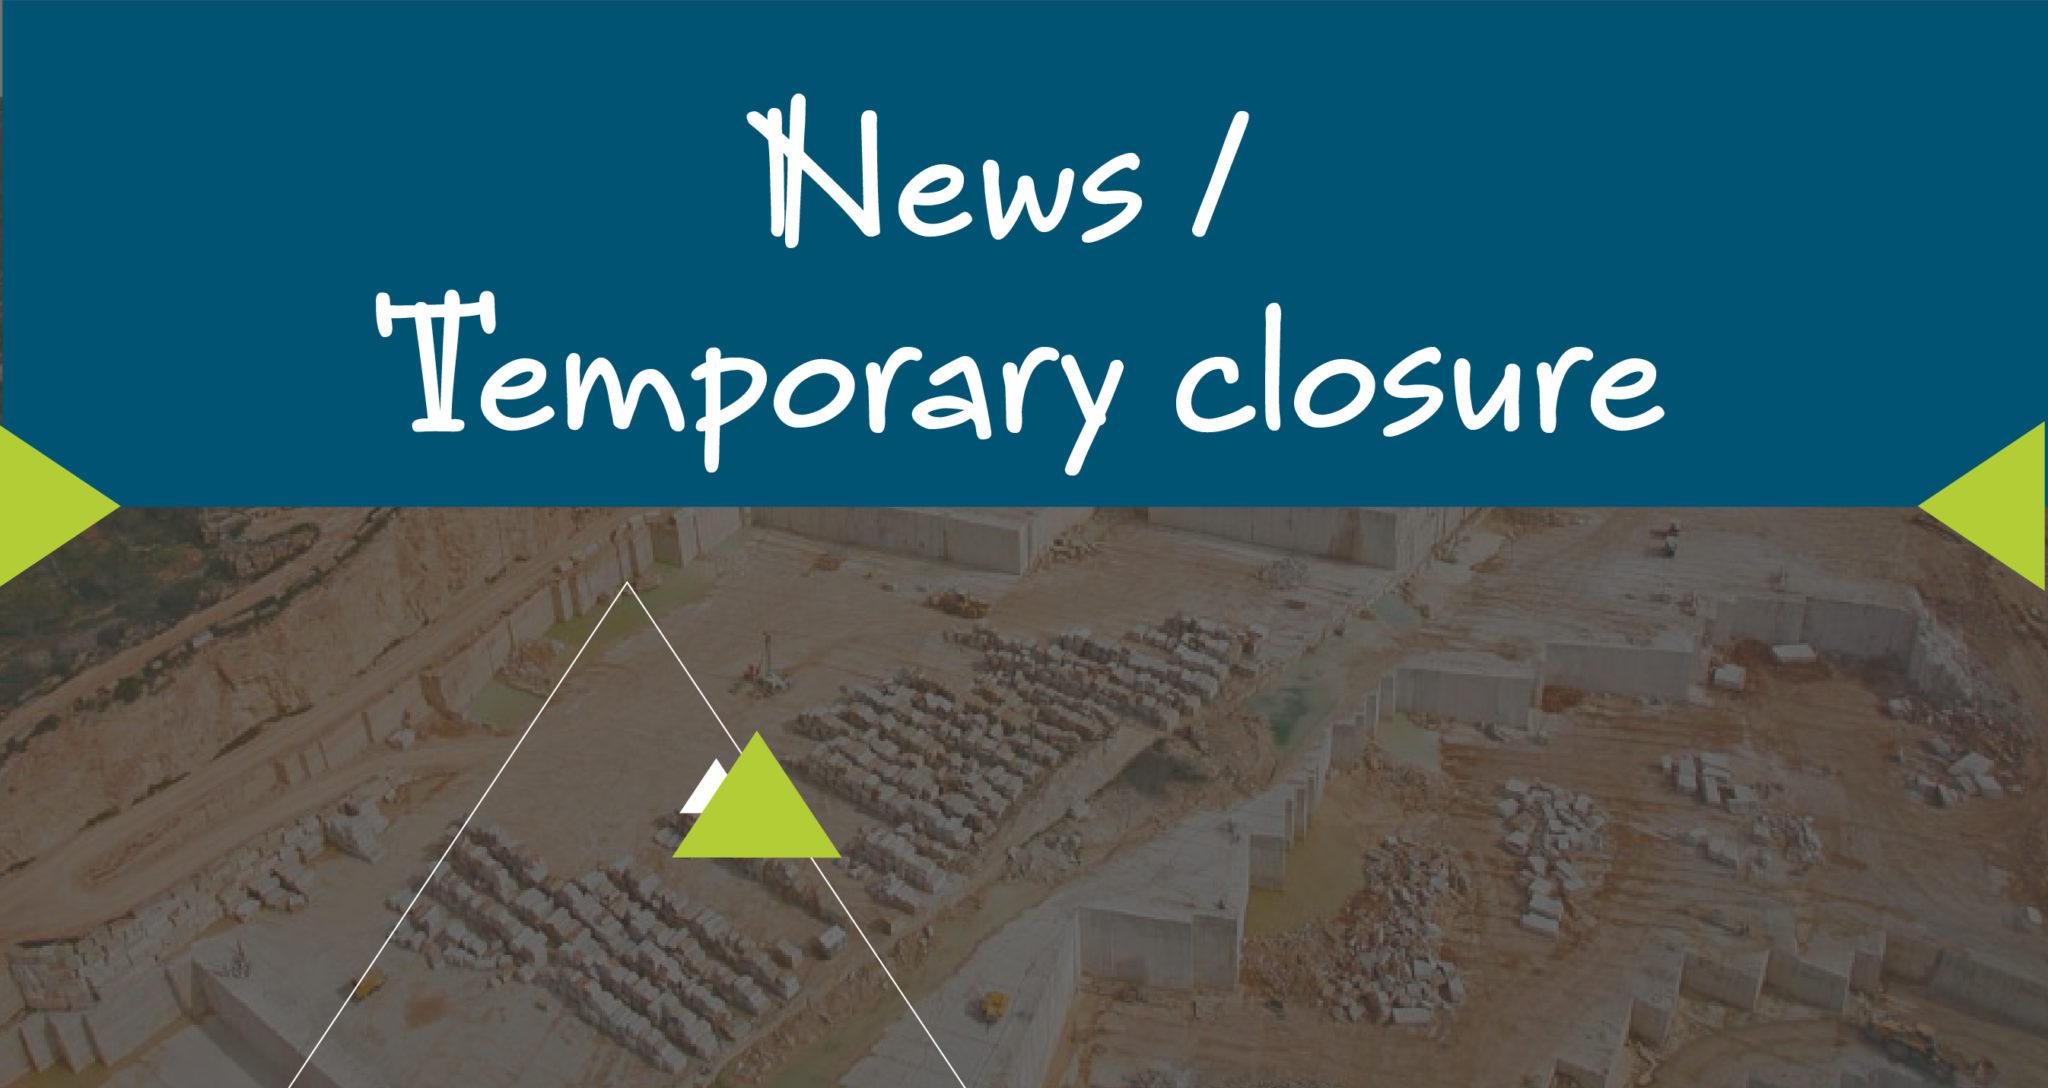 news covid-19 temporary closure